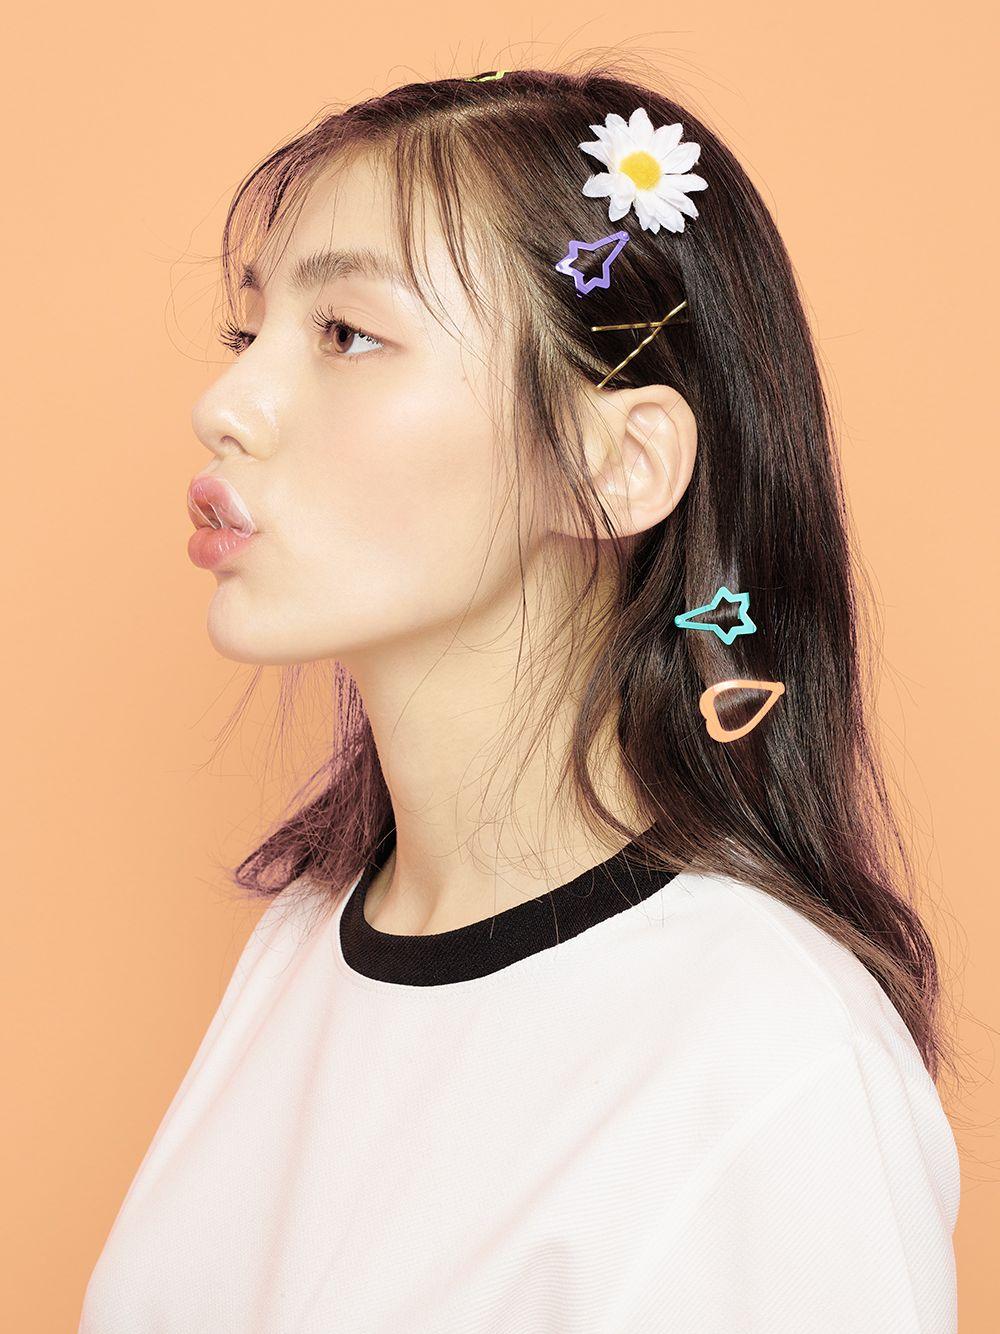 Kim Yong-ji in 2020 | Kim, Model, Korean drama